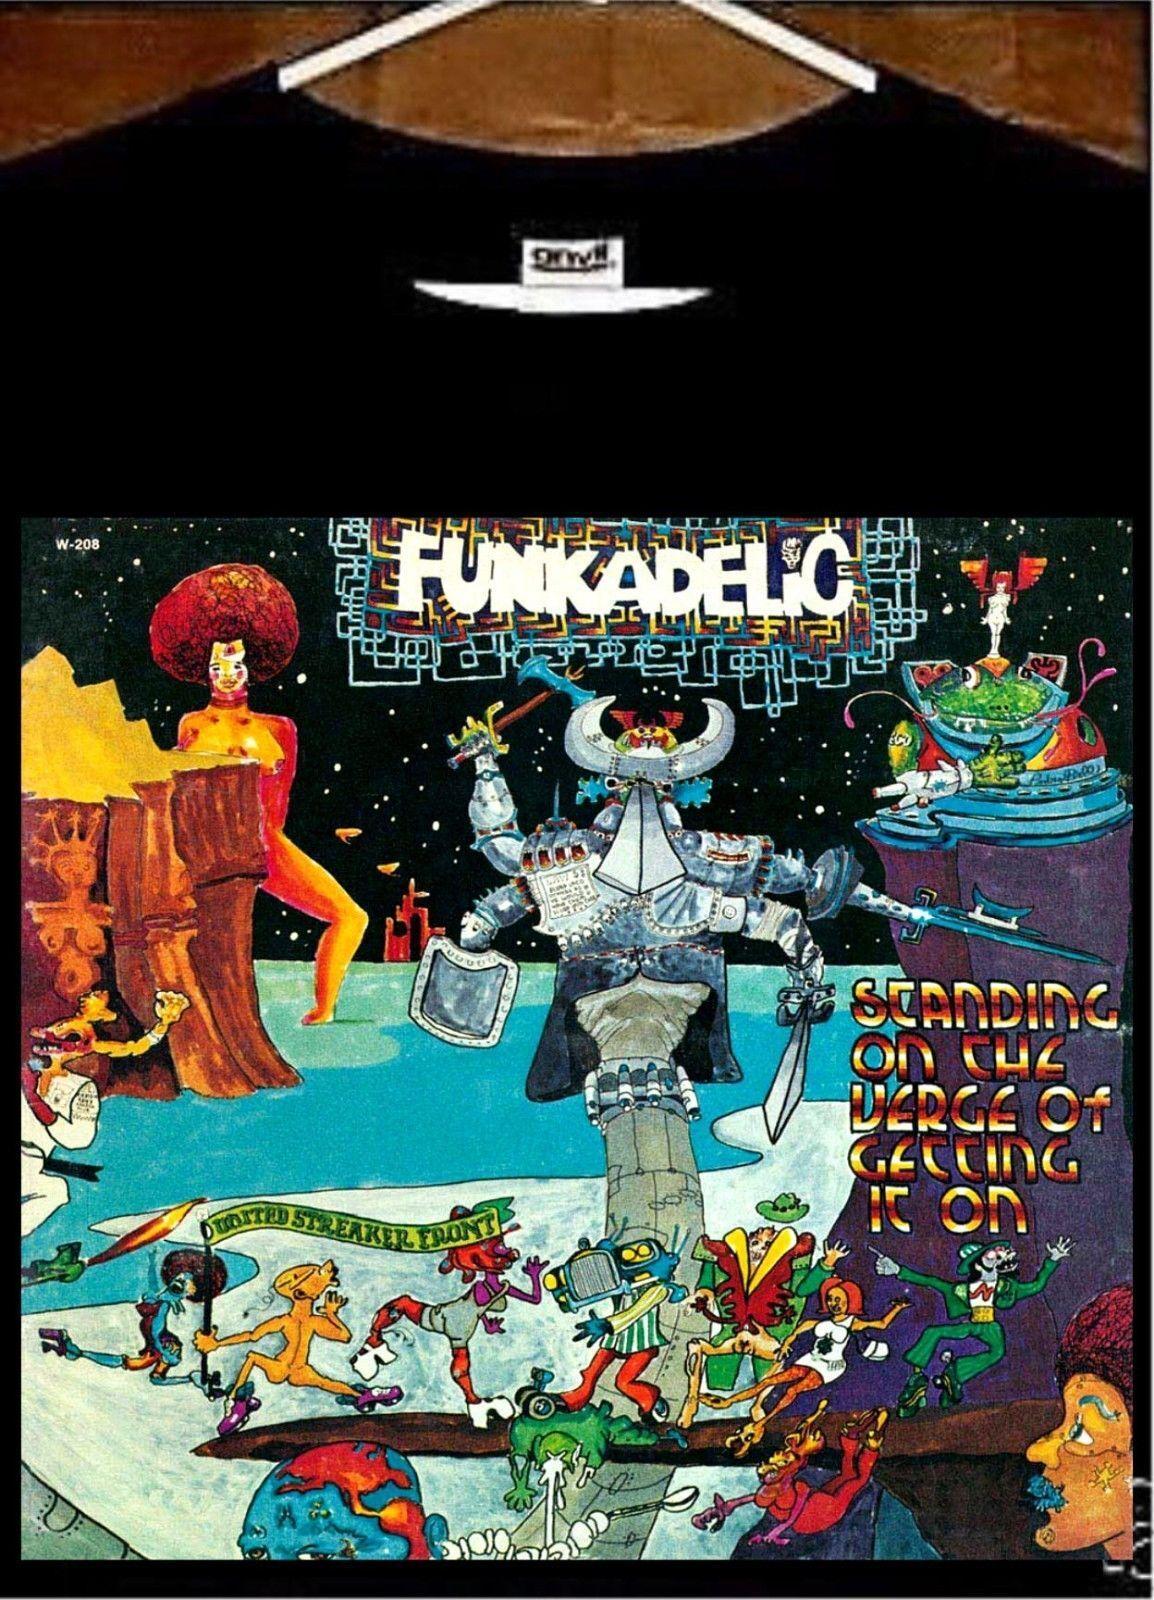 Funkadelic T shirt; Funkadelic Standing On The Verge Of Getting It On Tee shirt